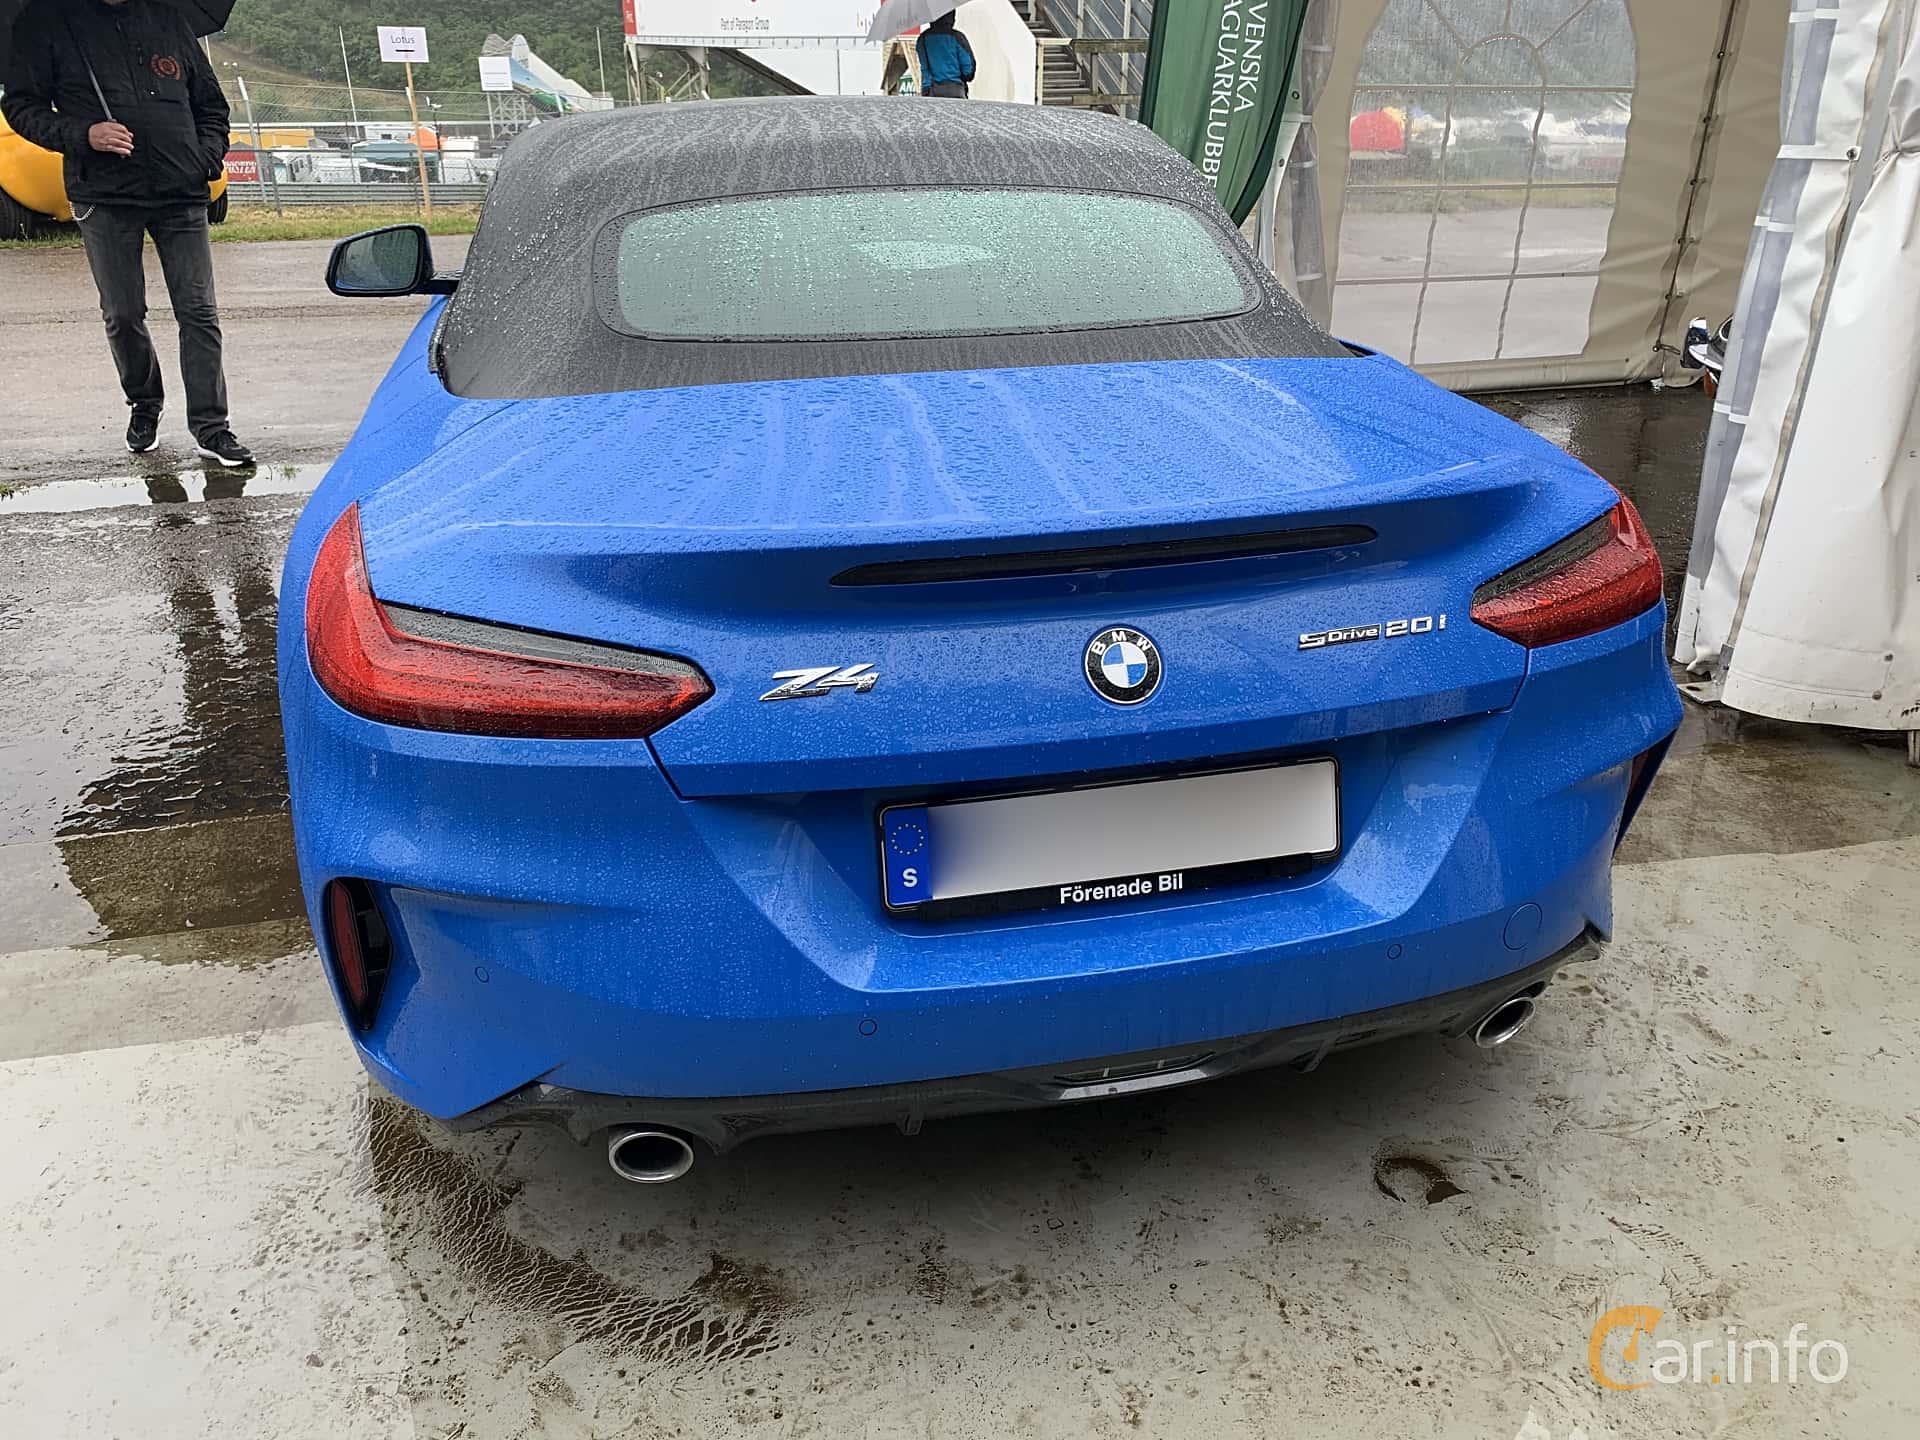 BMW Z4 sDrive20i  Steptronic, 197hp, 2019 at Svenskt sportvagnsmeeting 2019